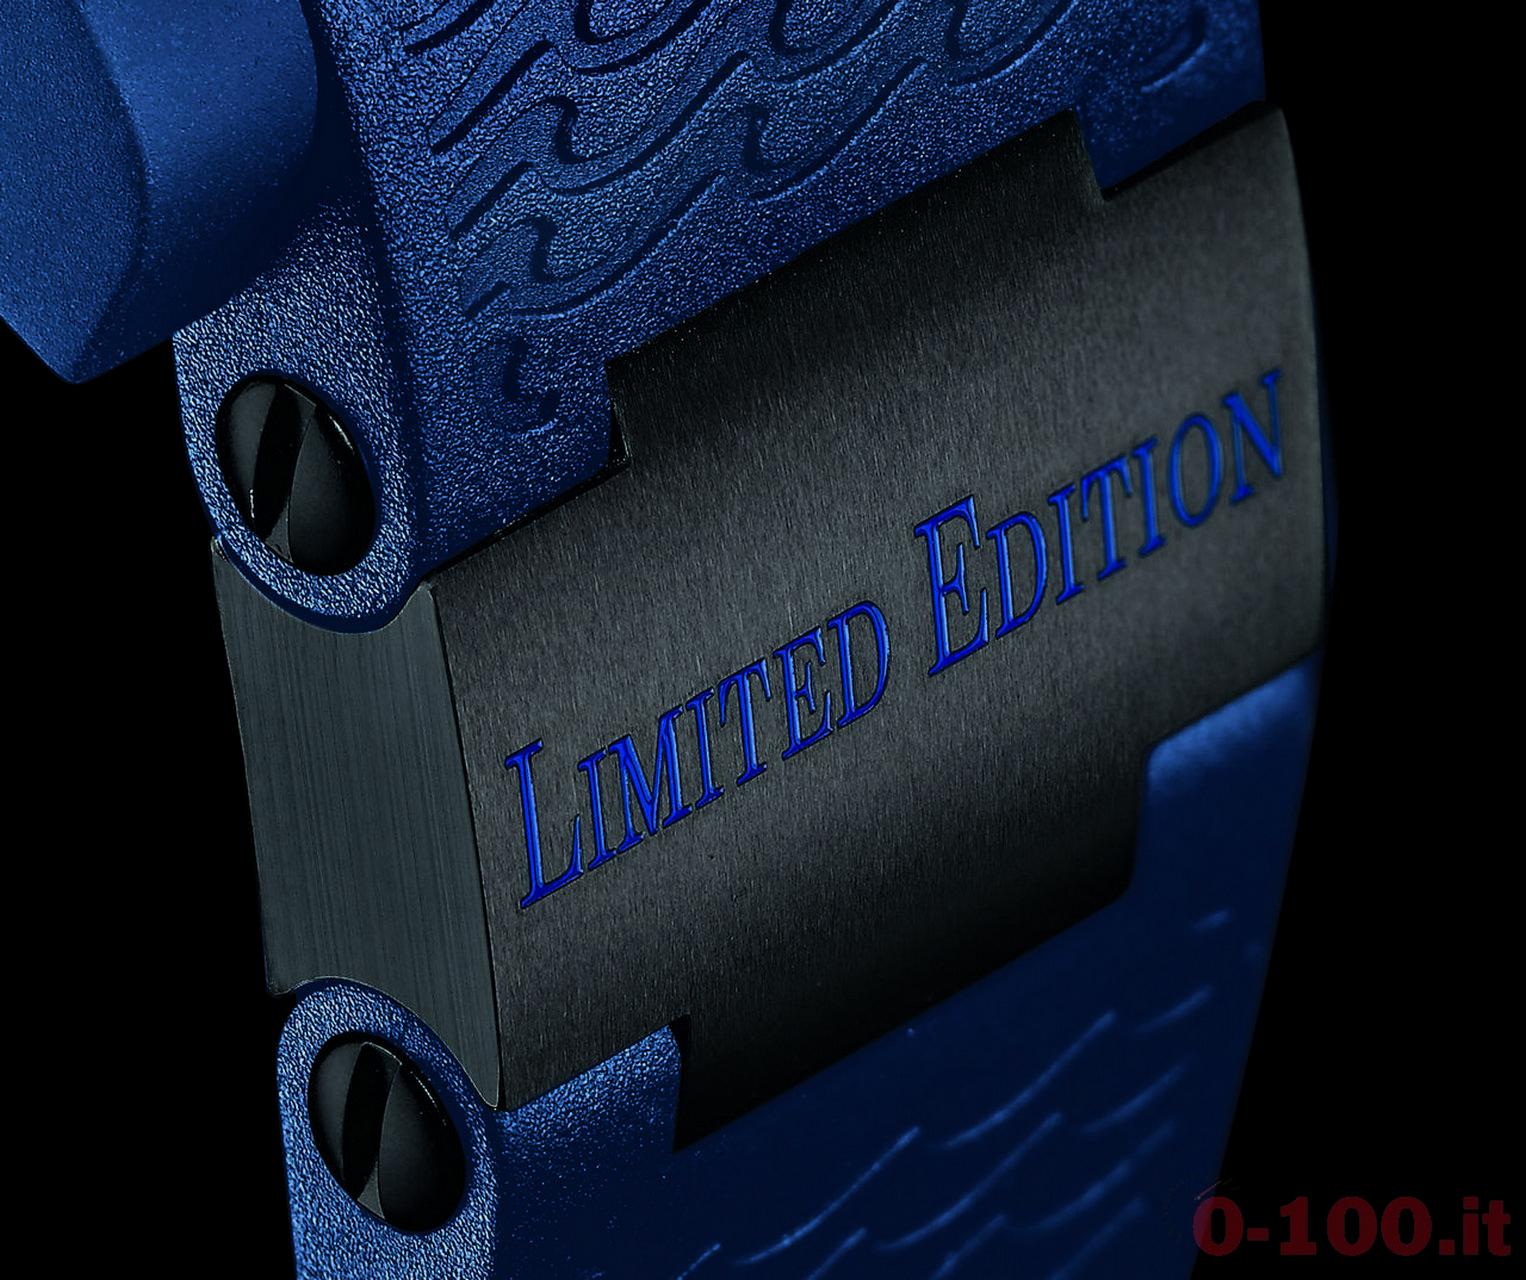 ulysse-nardin-blue-ocean-limited-edition-ref-263-99le-3c-price_0-1005